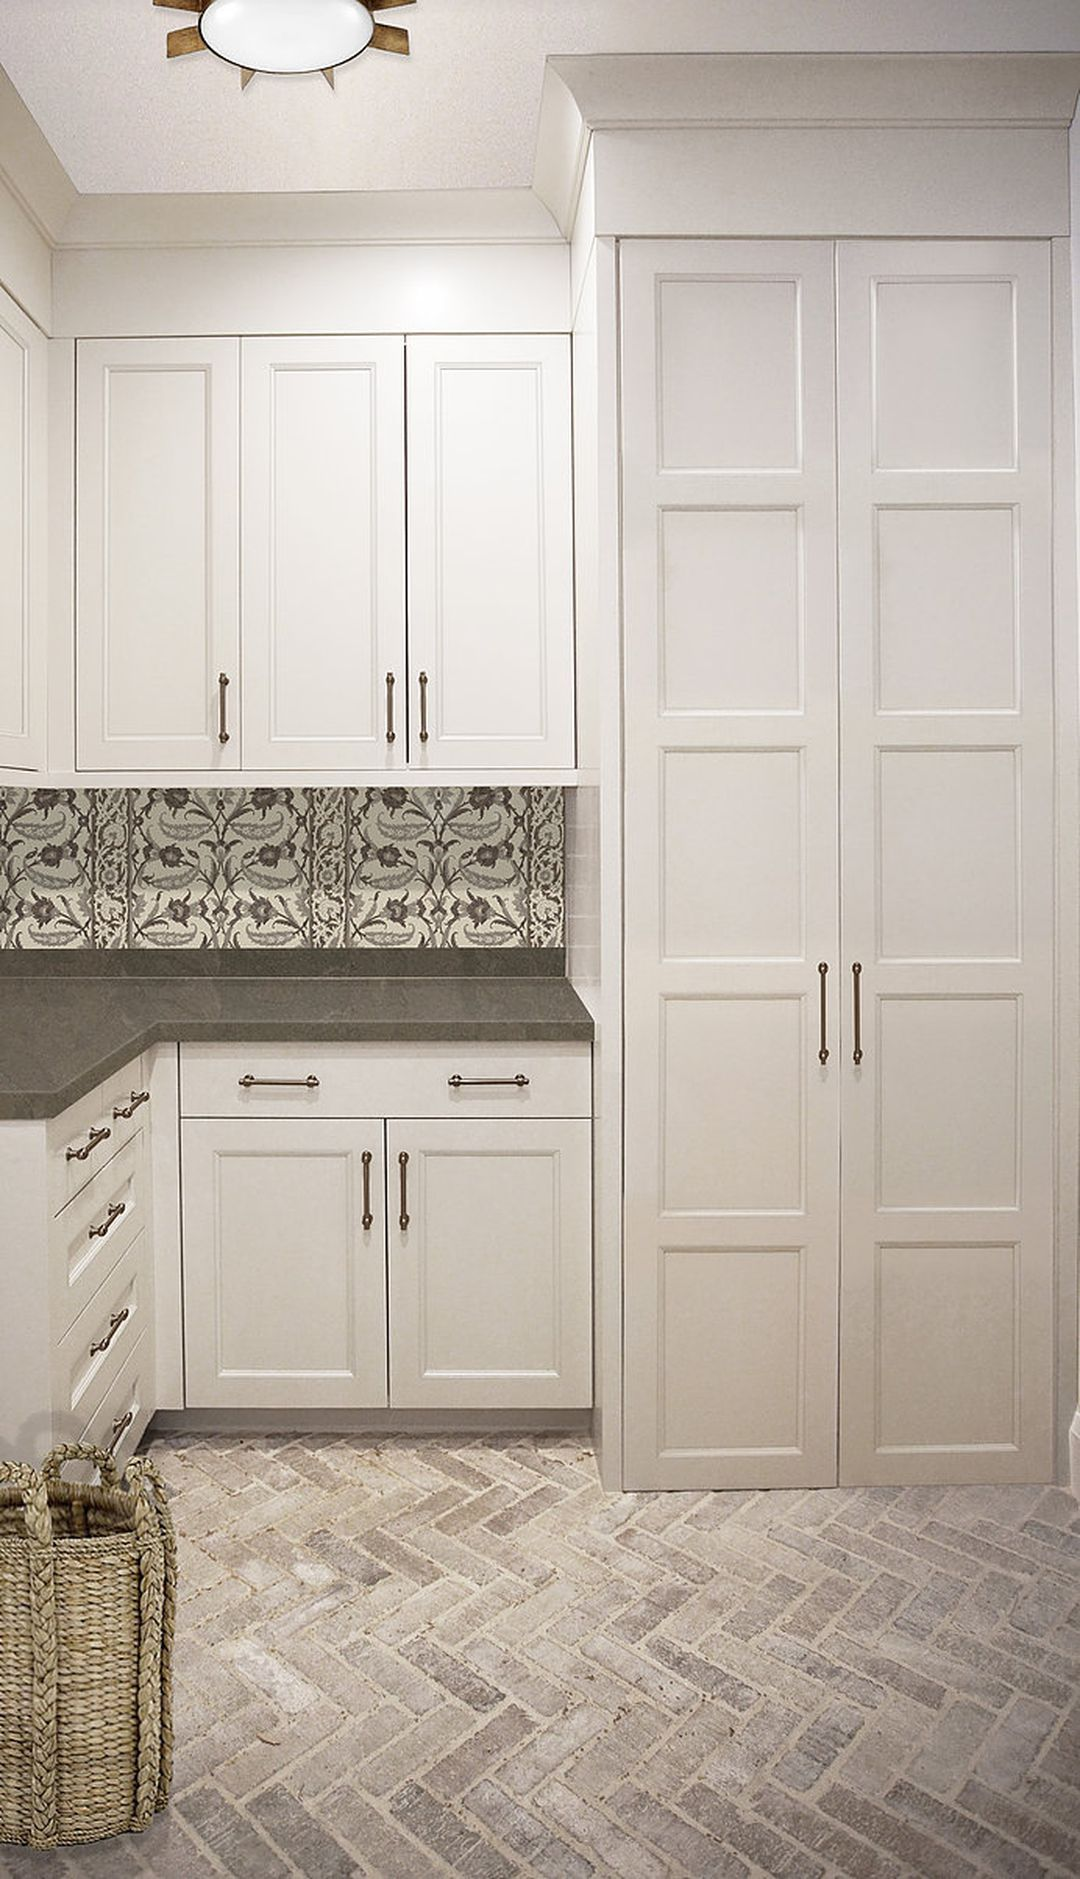 Beautiful Laundry Room Tile Design Ideas (22 in 2020